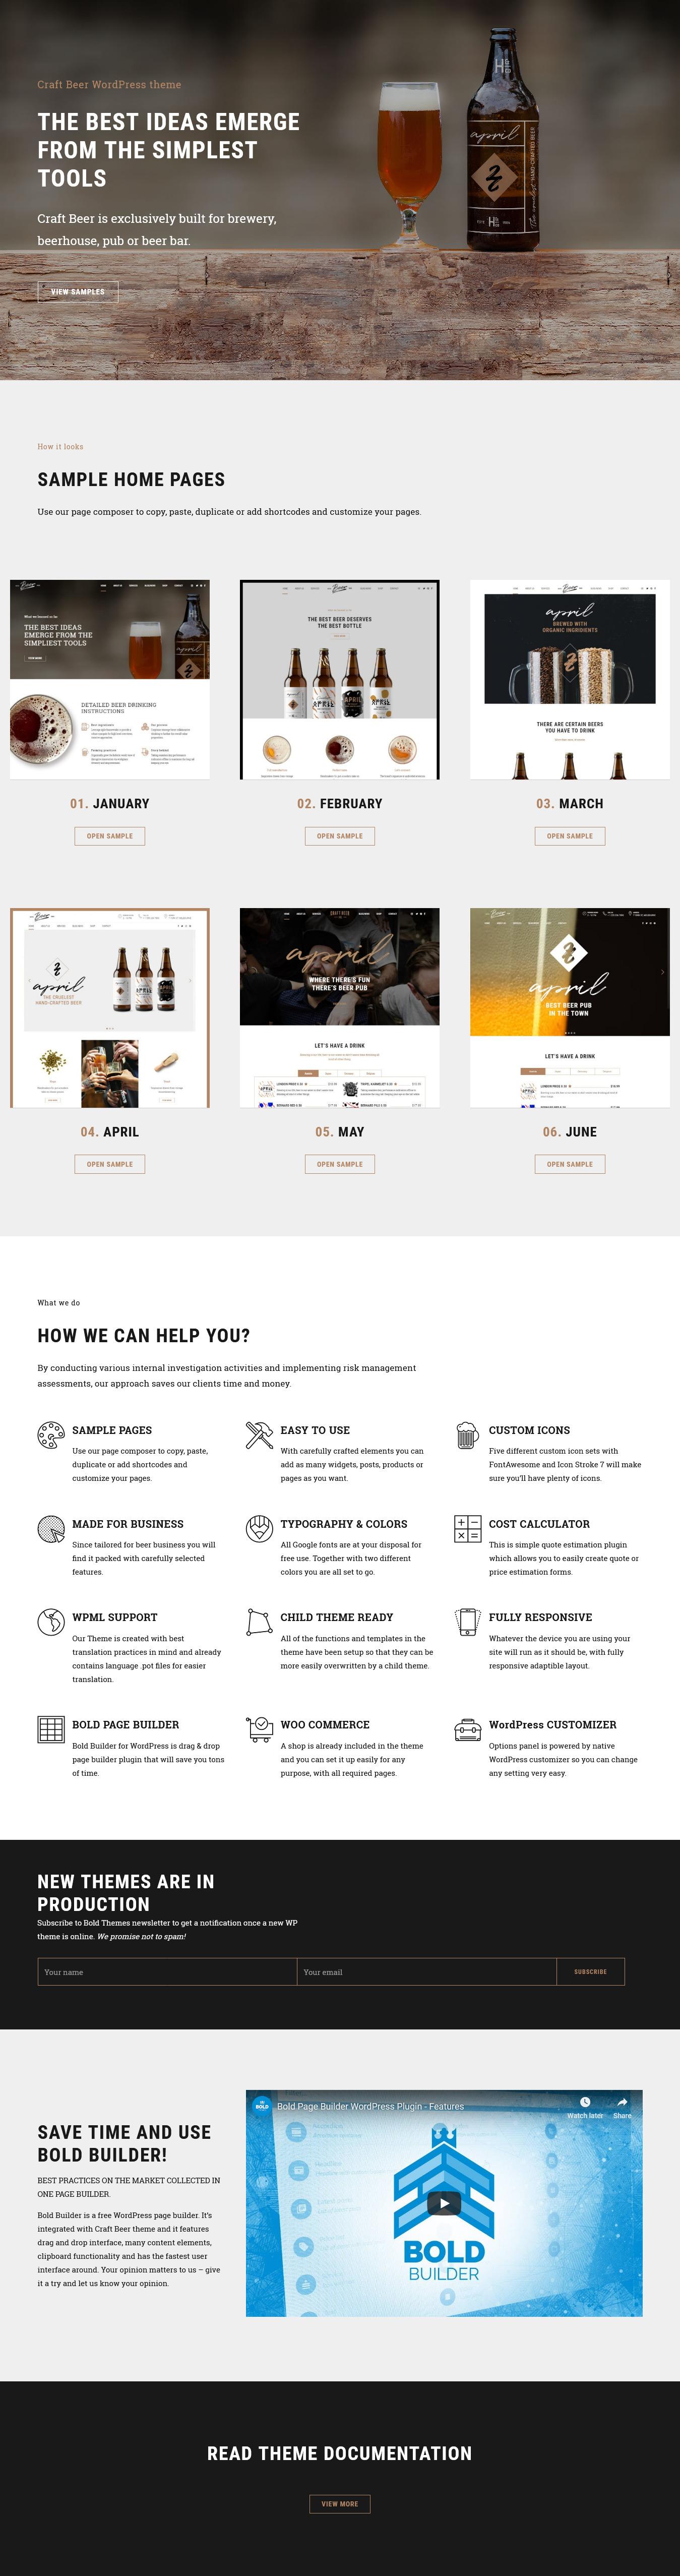 craft beer best premium bar pub wordpress theme - 10+ Best Premium Bar and Pub WordPress Themes